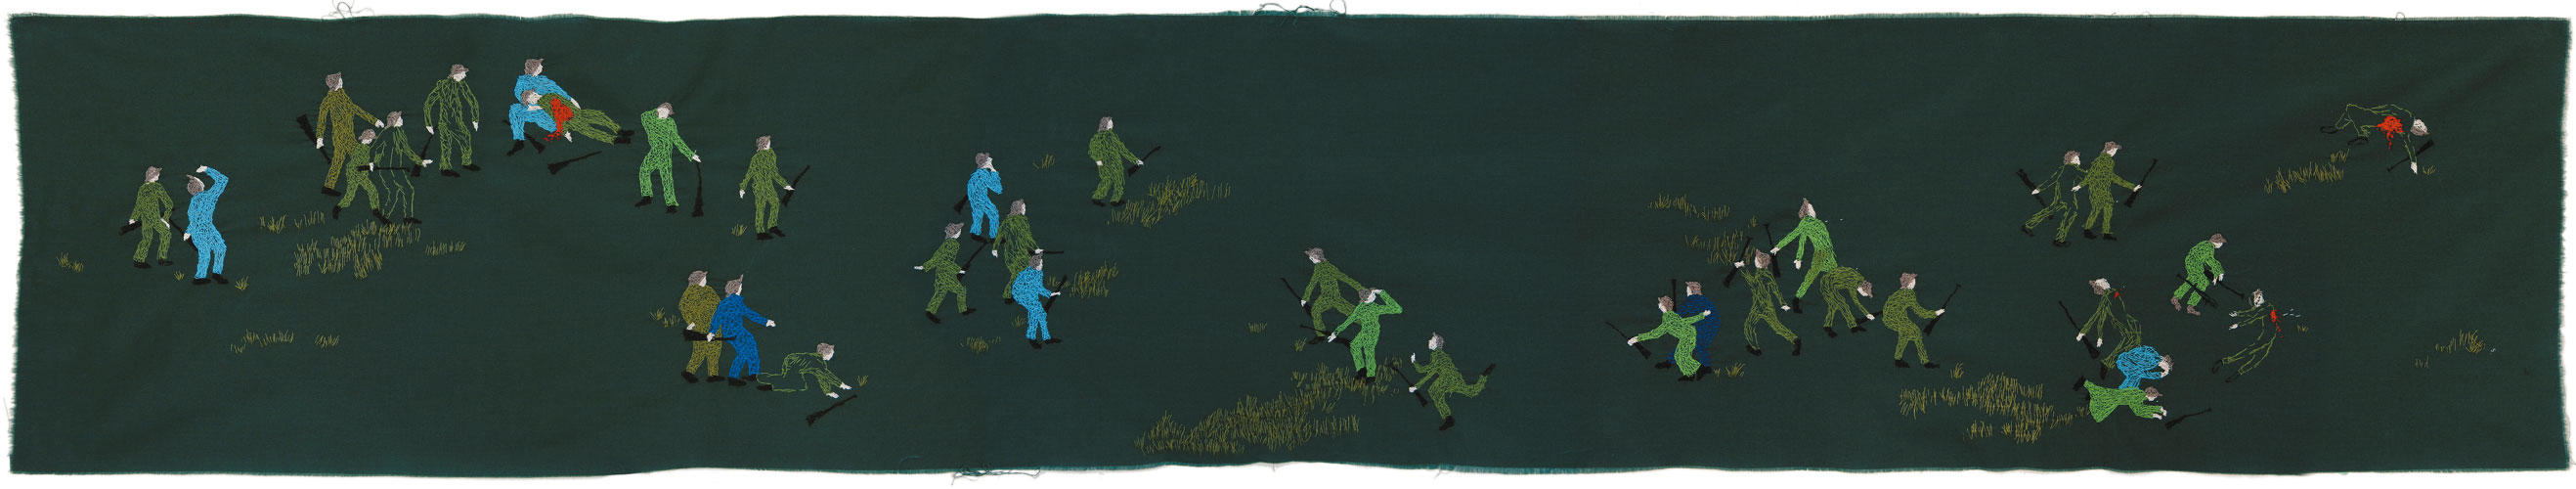 """Heroism, brutality, despair, friendship and death (Epic I)"", 28x 160 cm, thread on fabric"